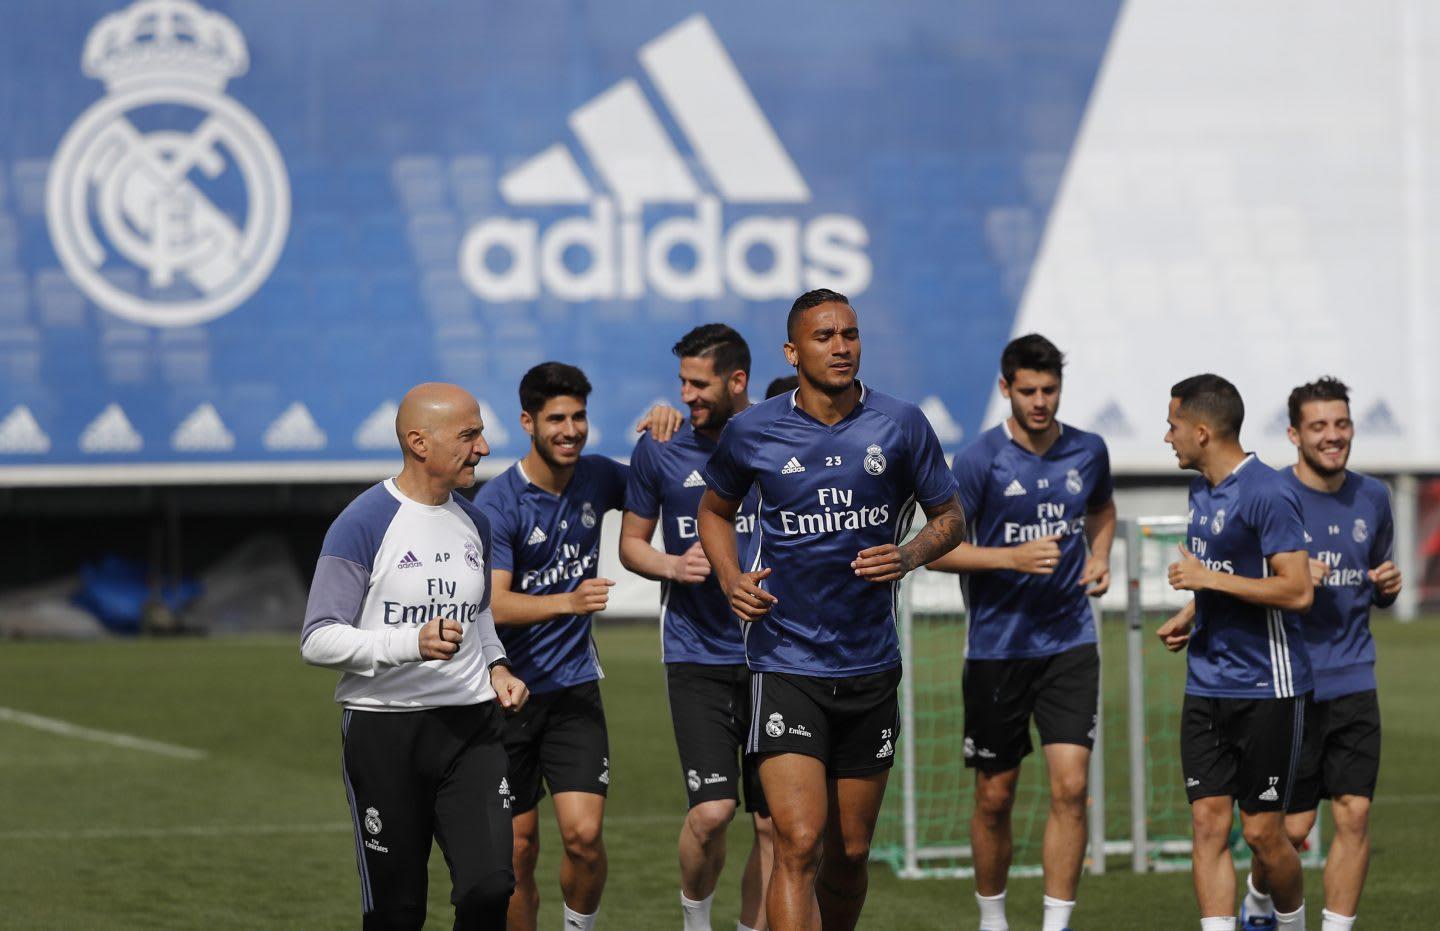 adidas-Real-Madrid-miCoach-football-fitness-training-Antonio-Pintus